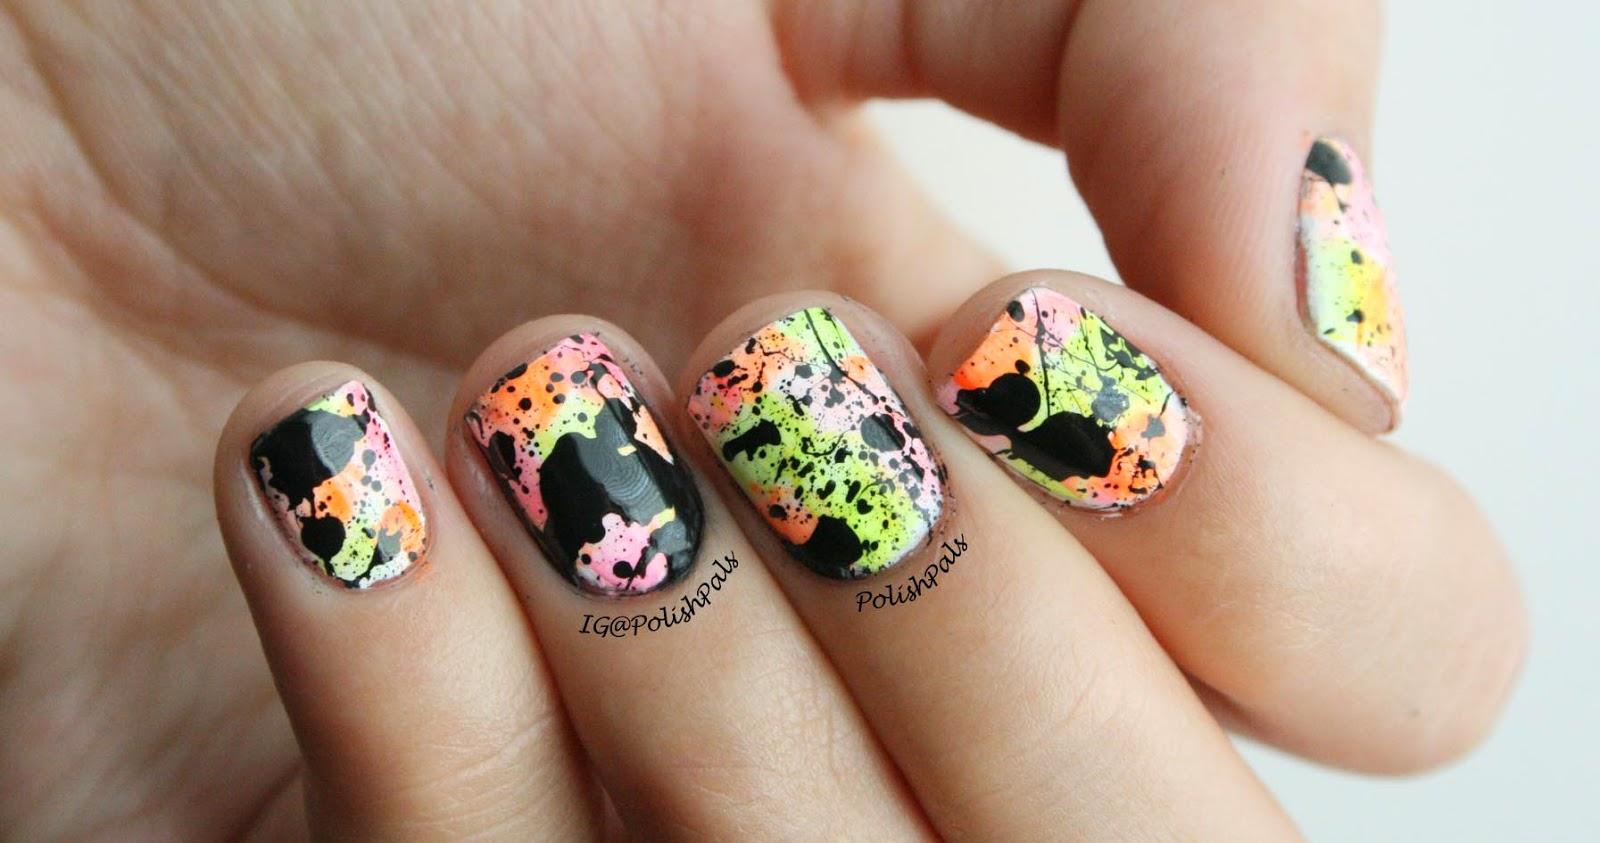 Neon Splatter Paint Nails This Neon Splatter Paint